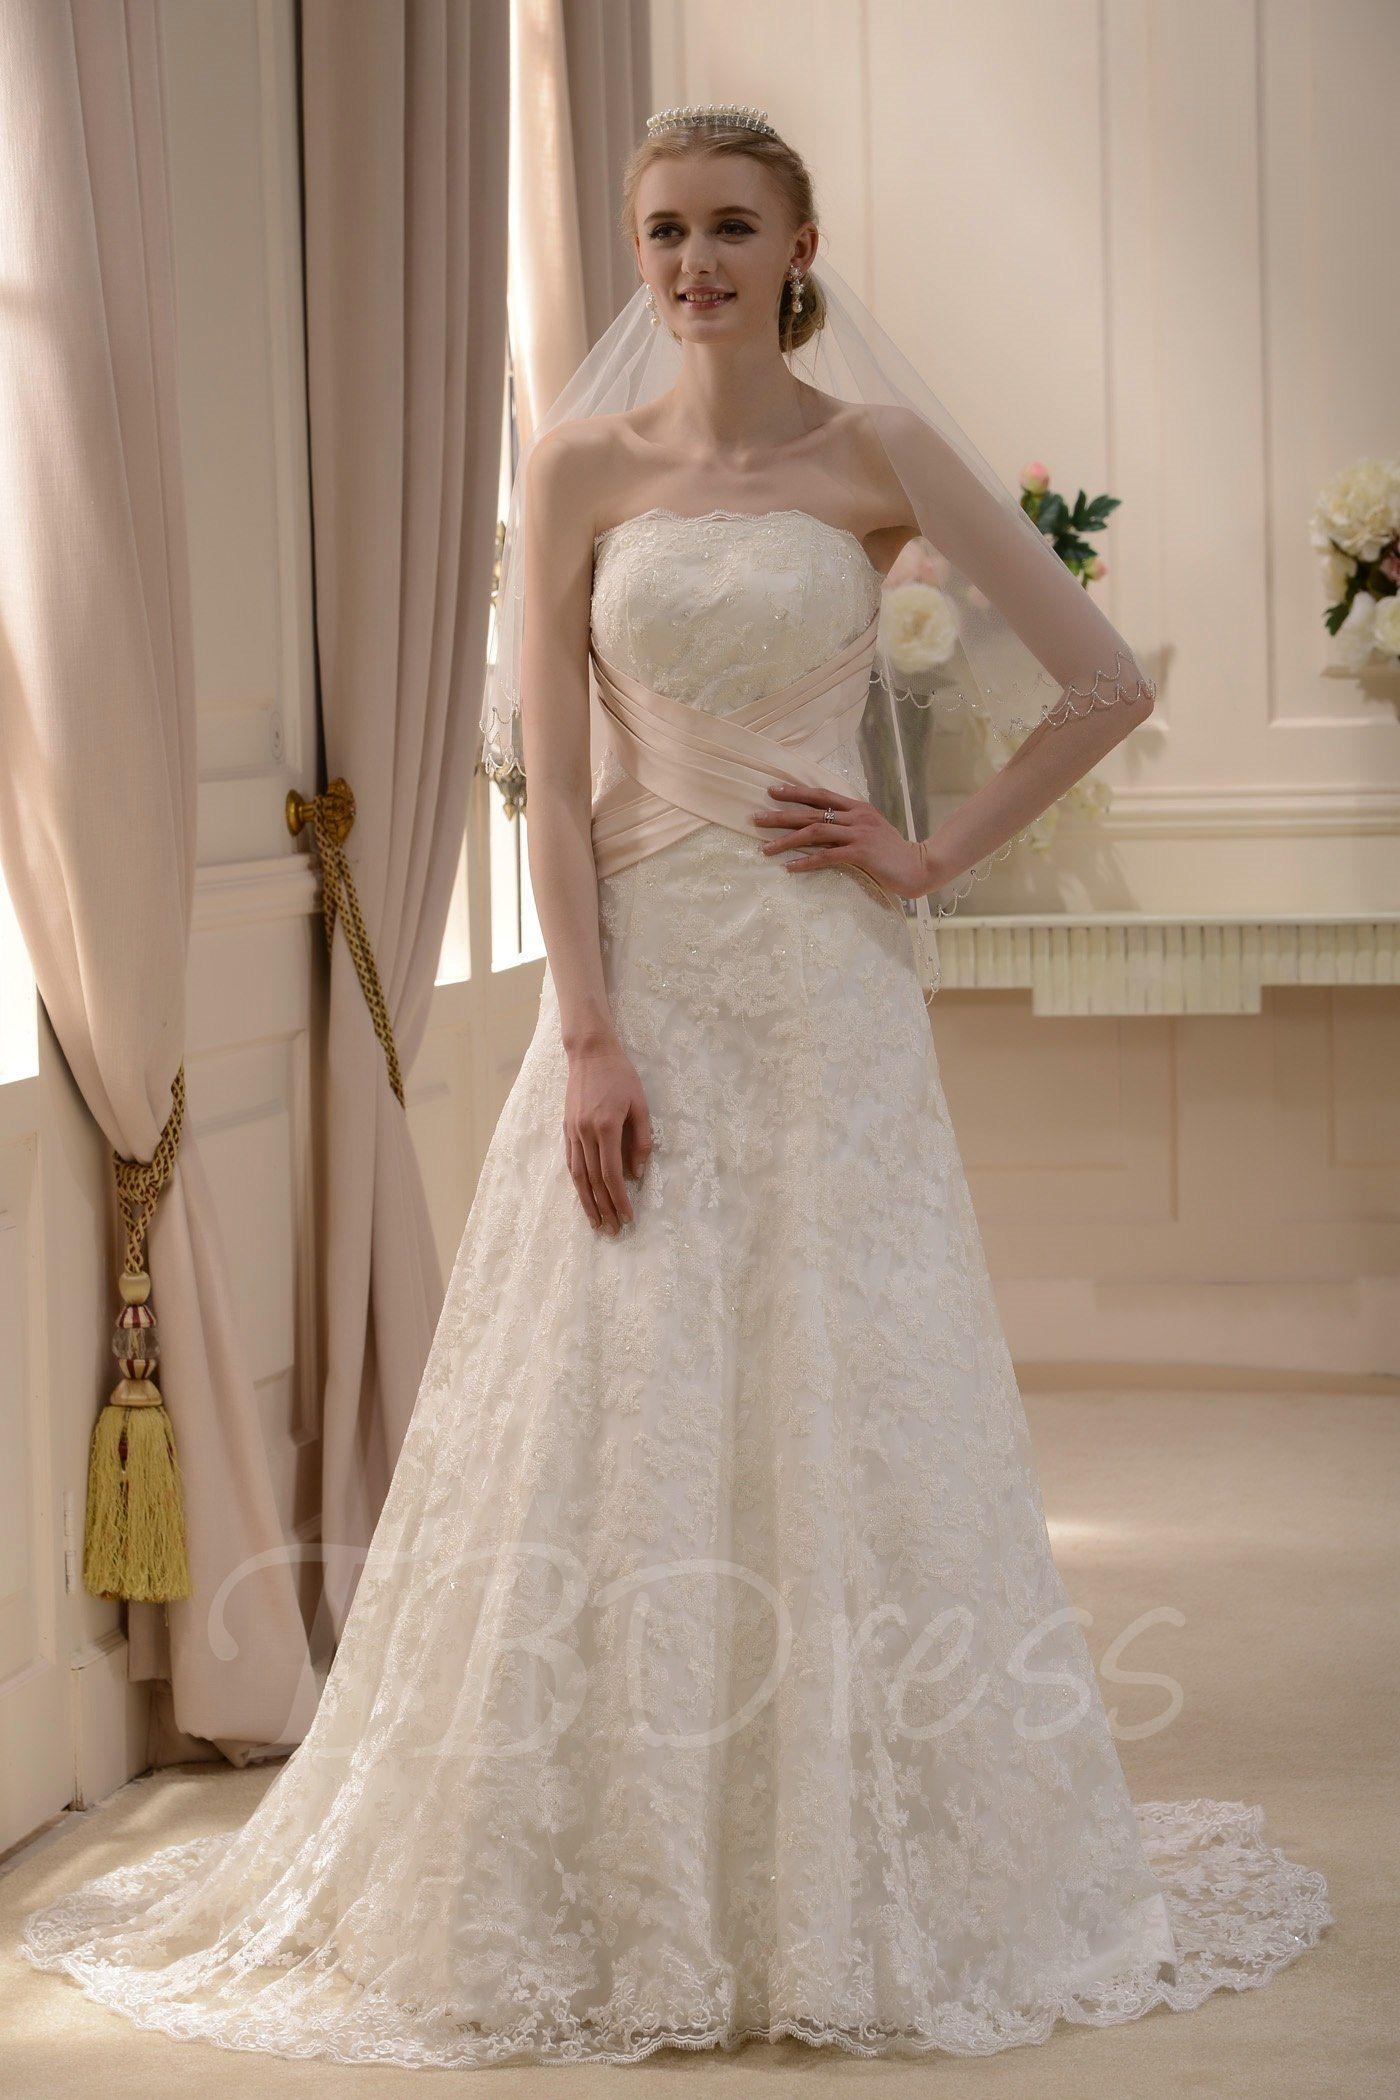 Elegant wedding dresses for mature brides  Slight ALinePrincess Strapless Court Train Wedding Dress